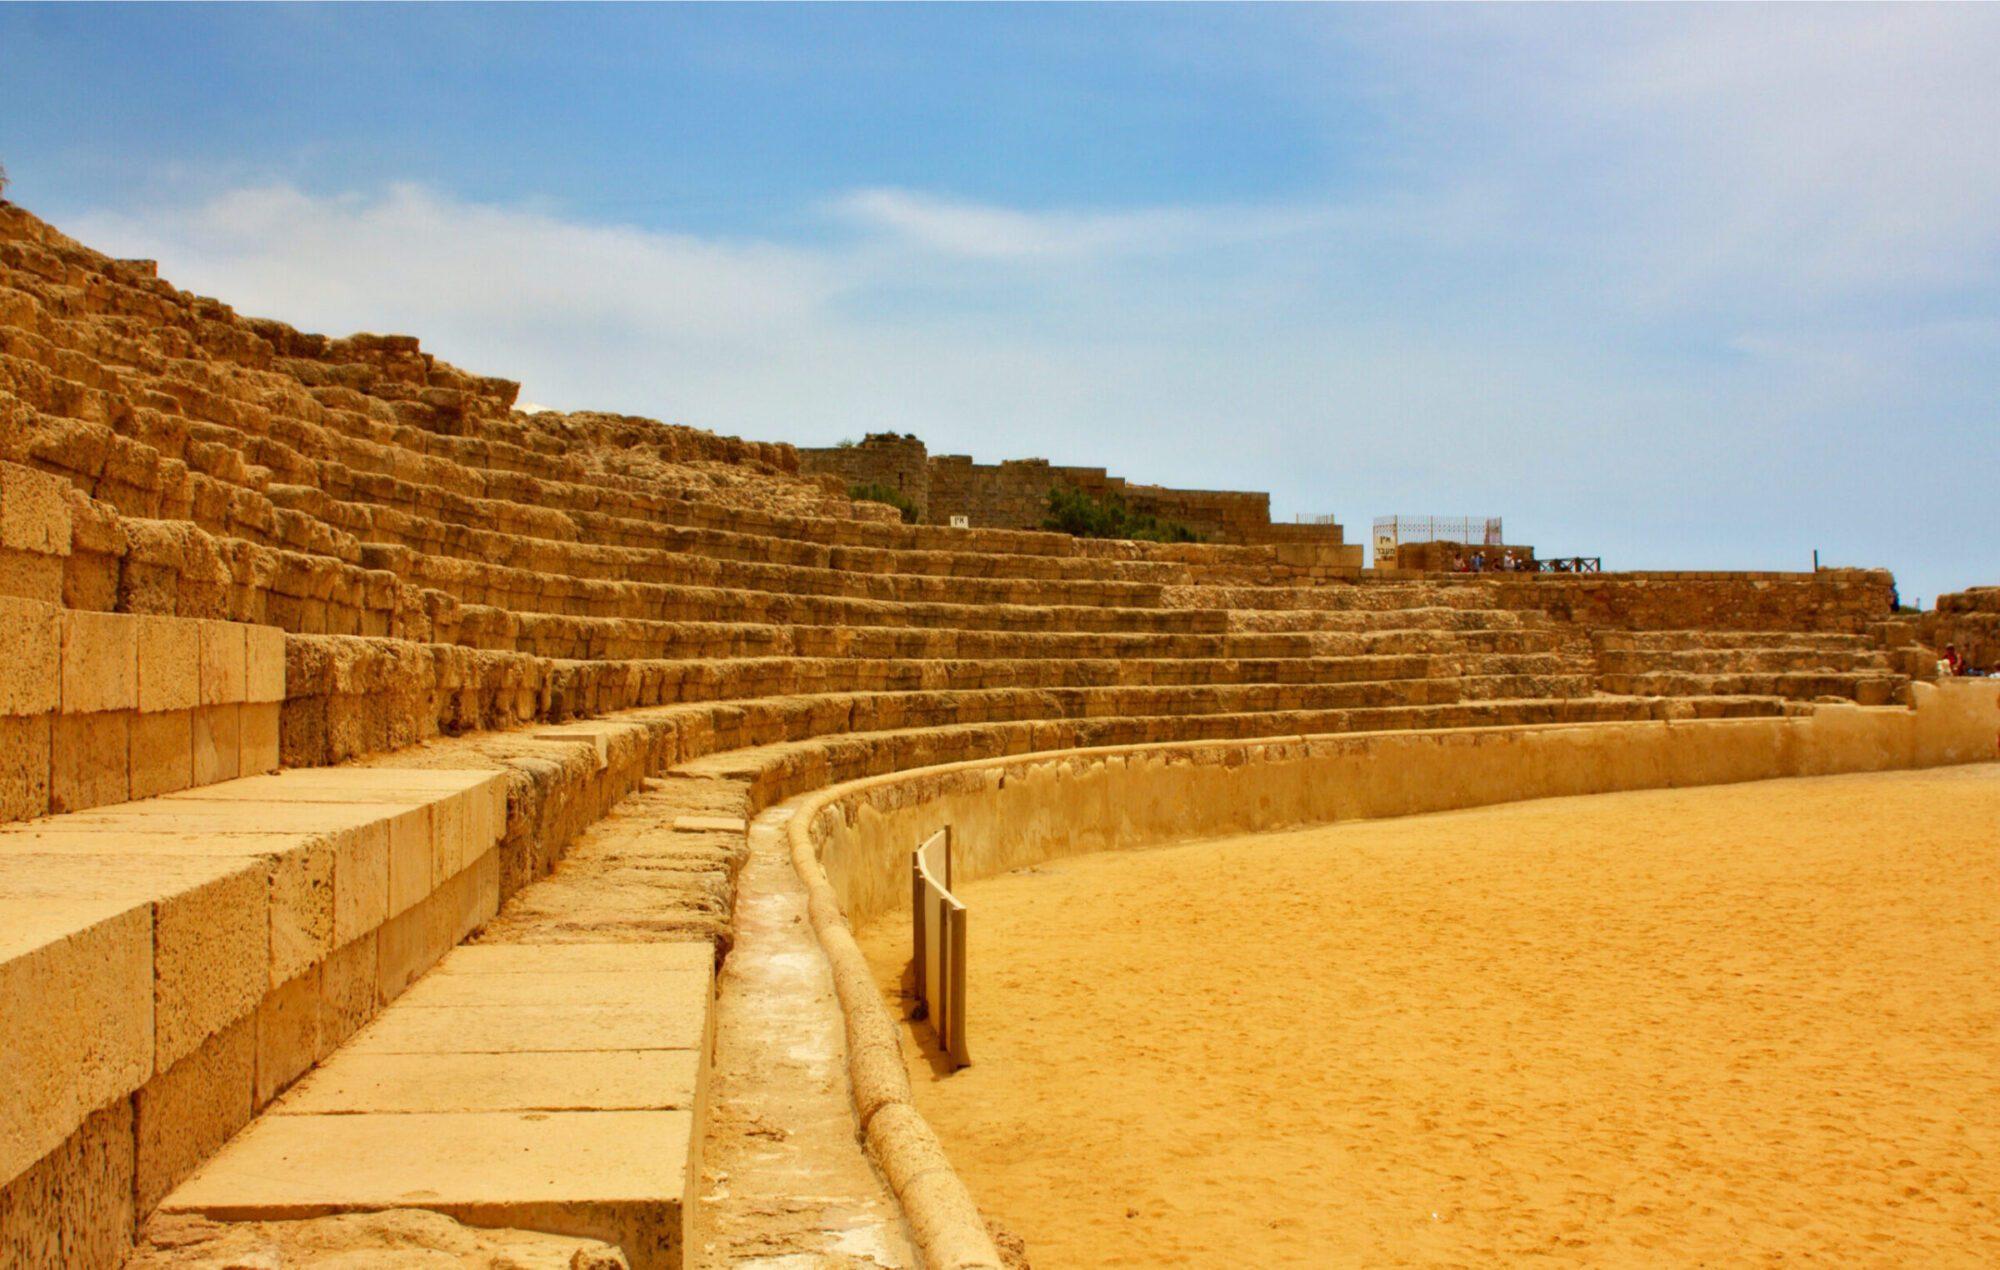 Israel Archaeological One Day Tours - Caesarea Hippodrome